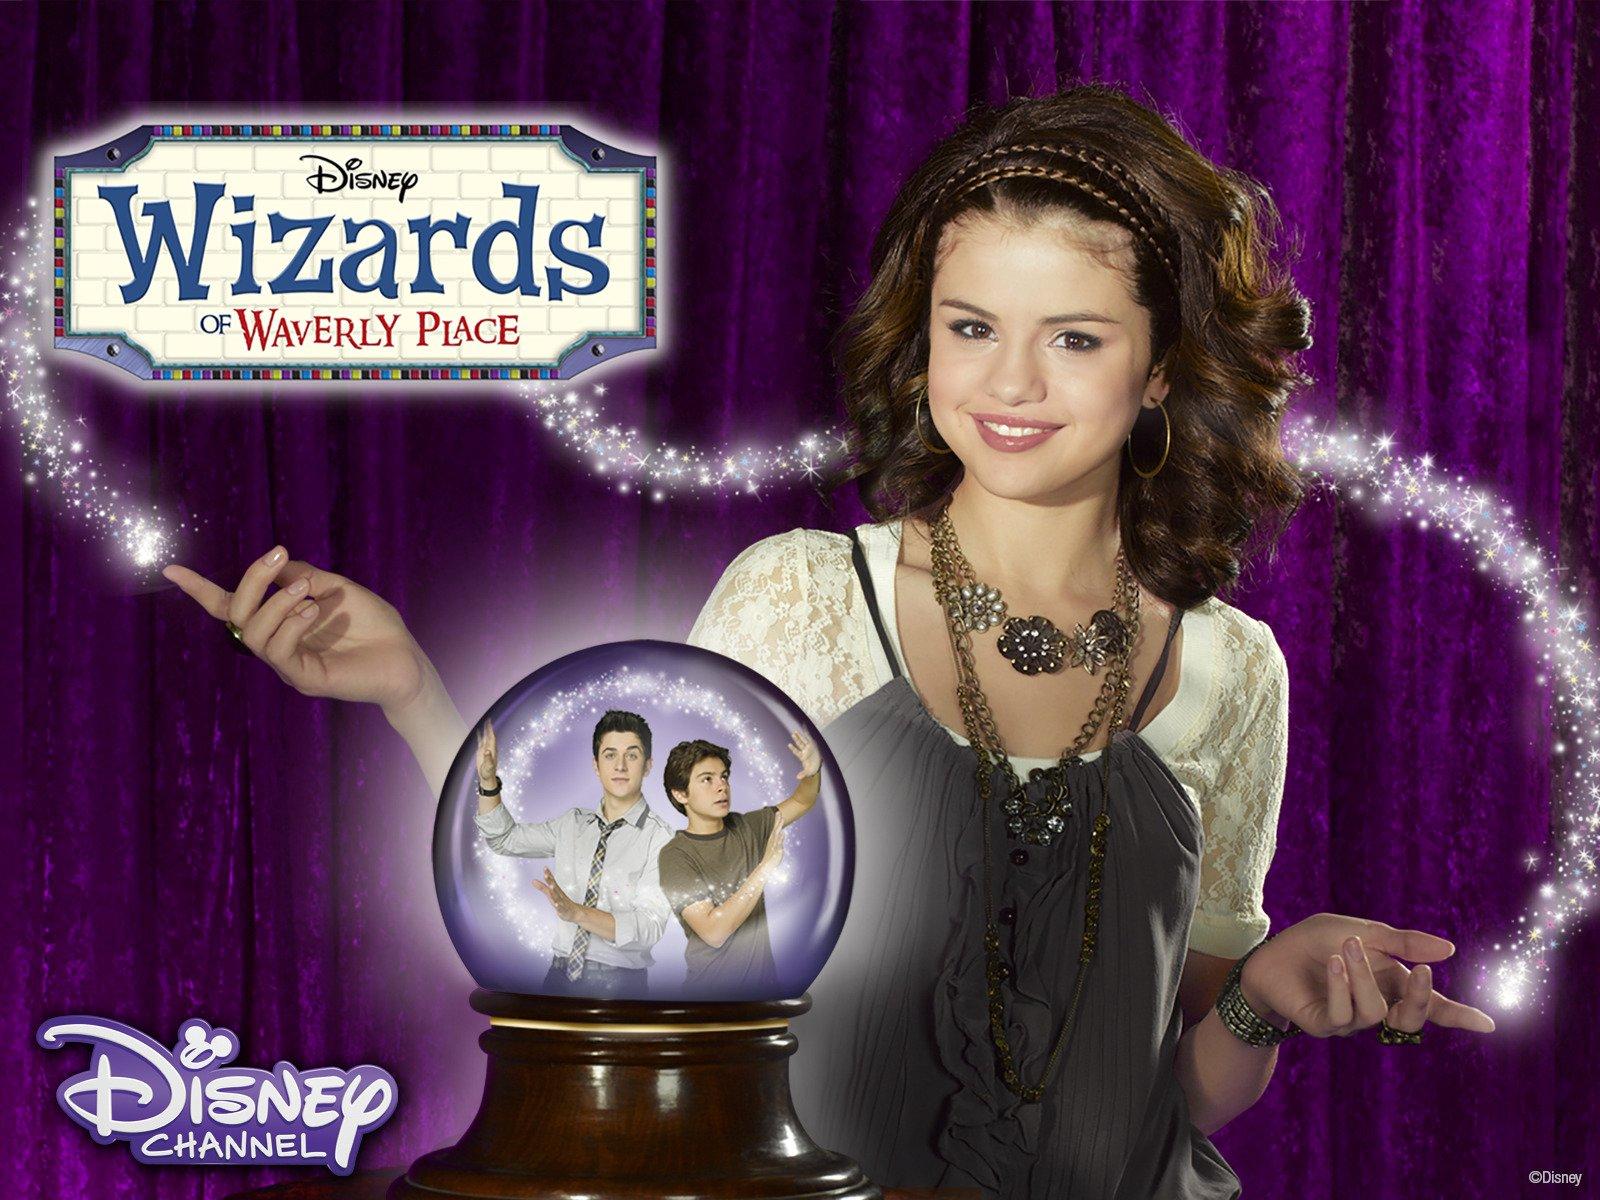 wizards of waverly place season 3 episode 22 full episode